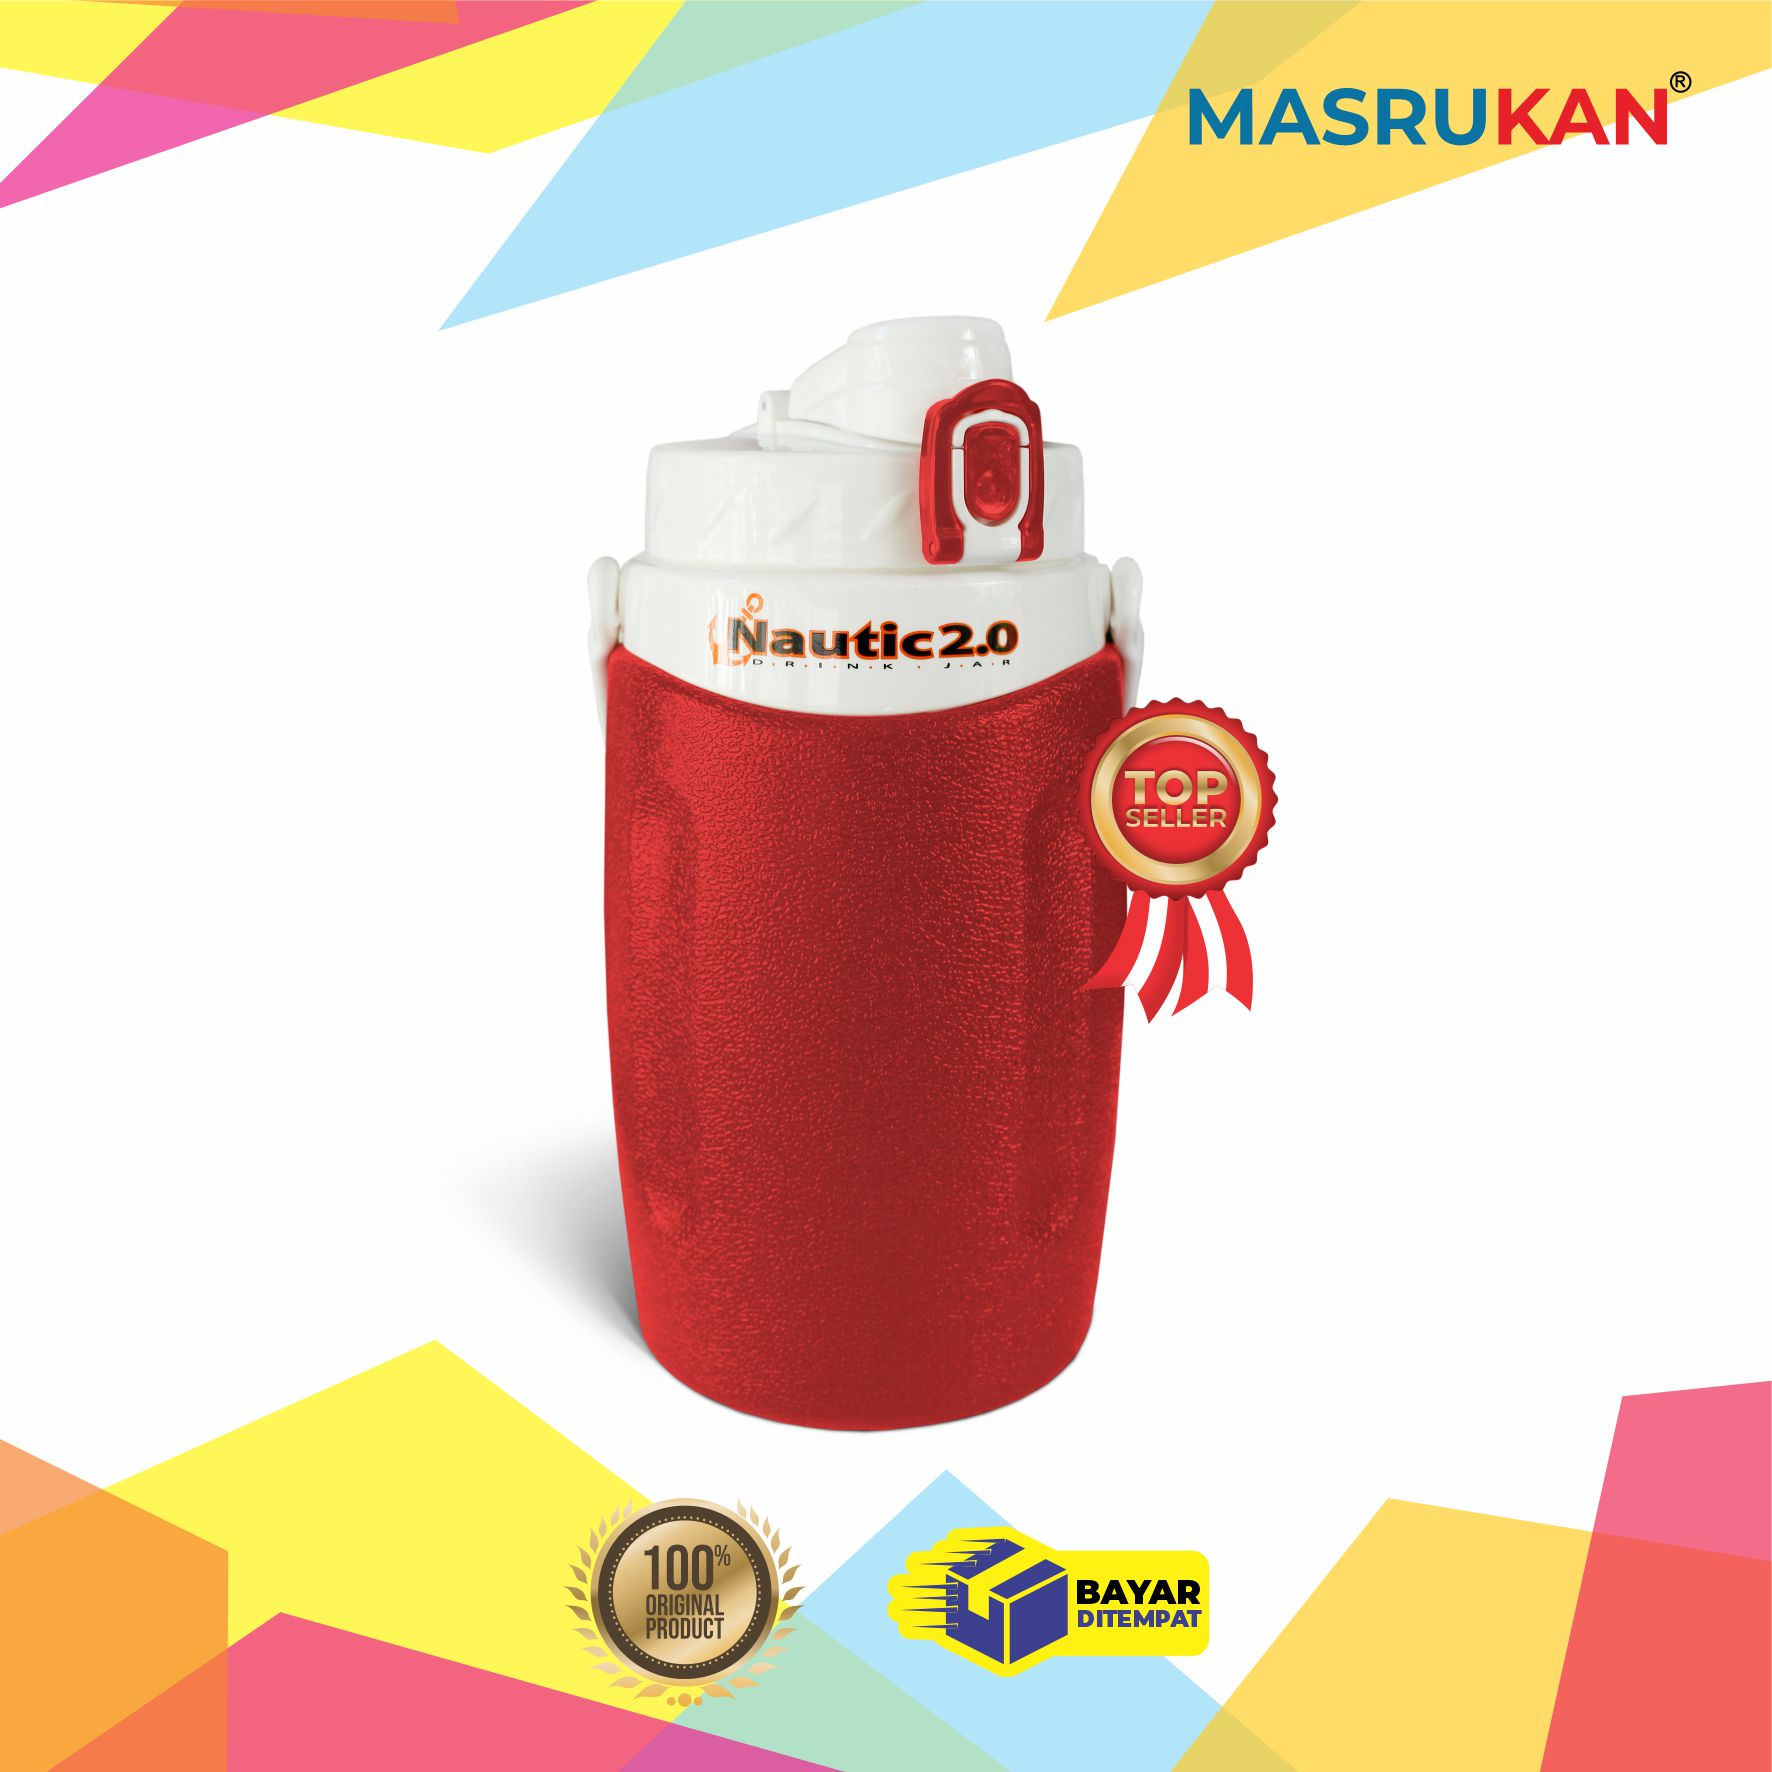 termos nautic jar 2 liter dispenser air minum cooler termos termos bekal termos sebaguna tahan panas dingin 2 liter